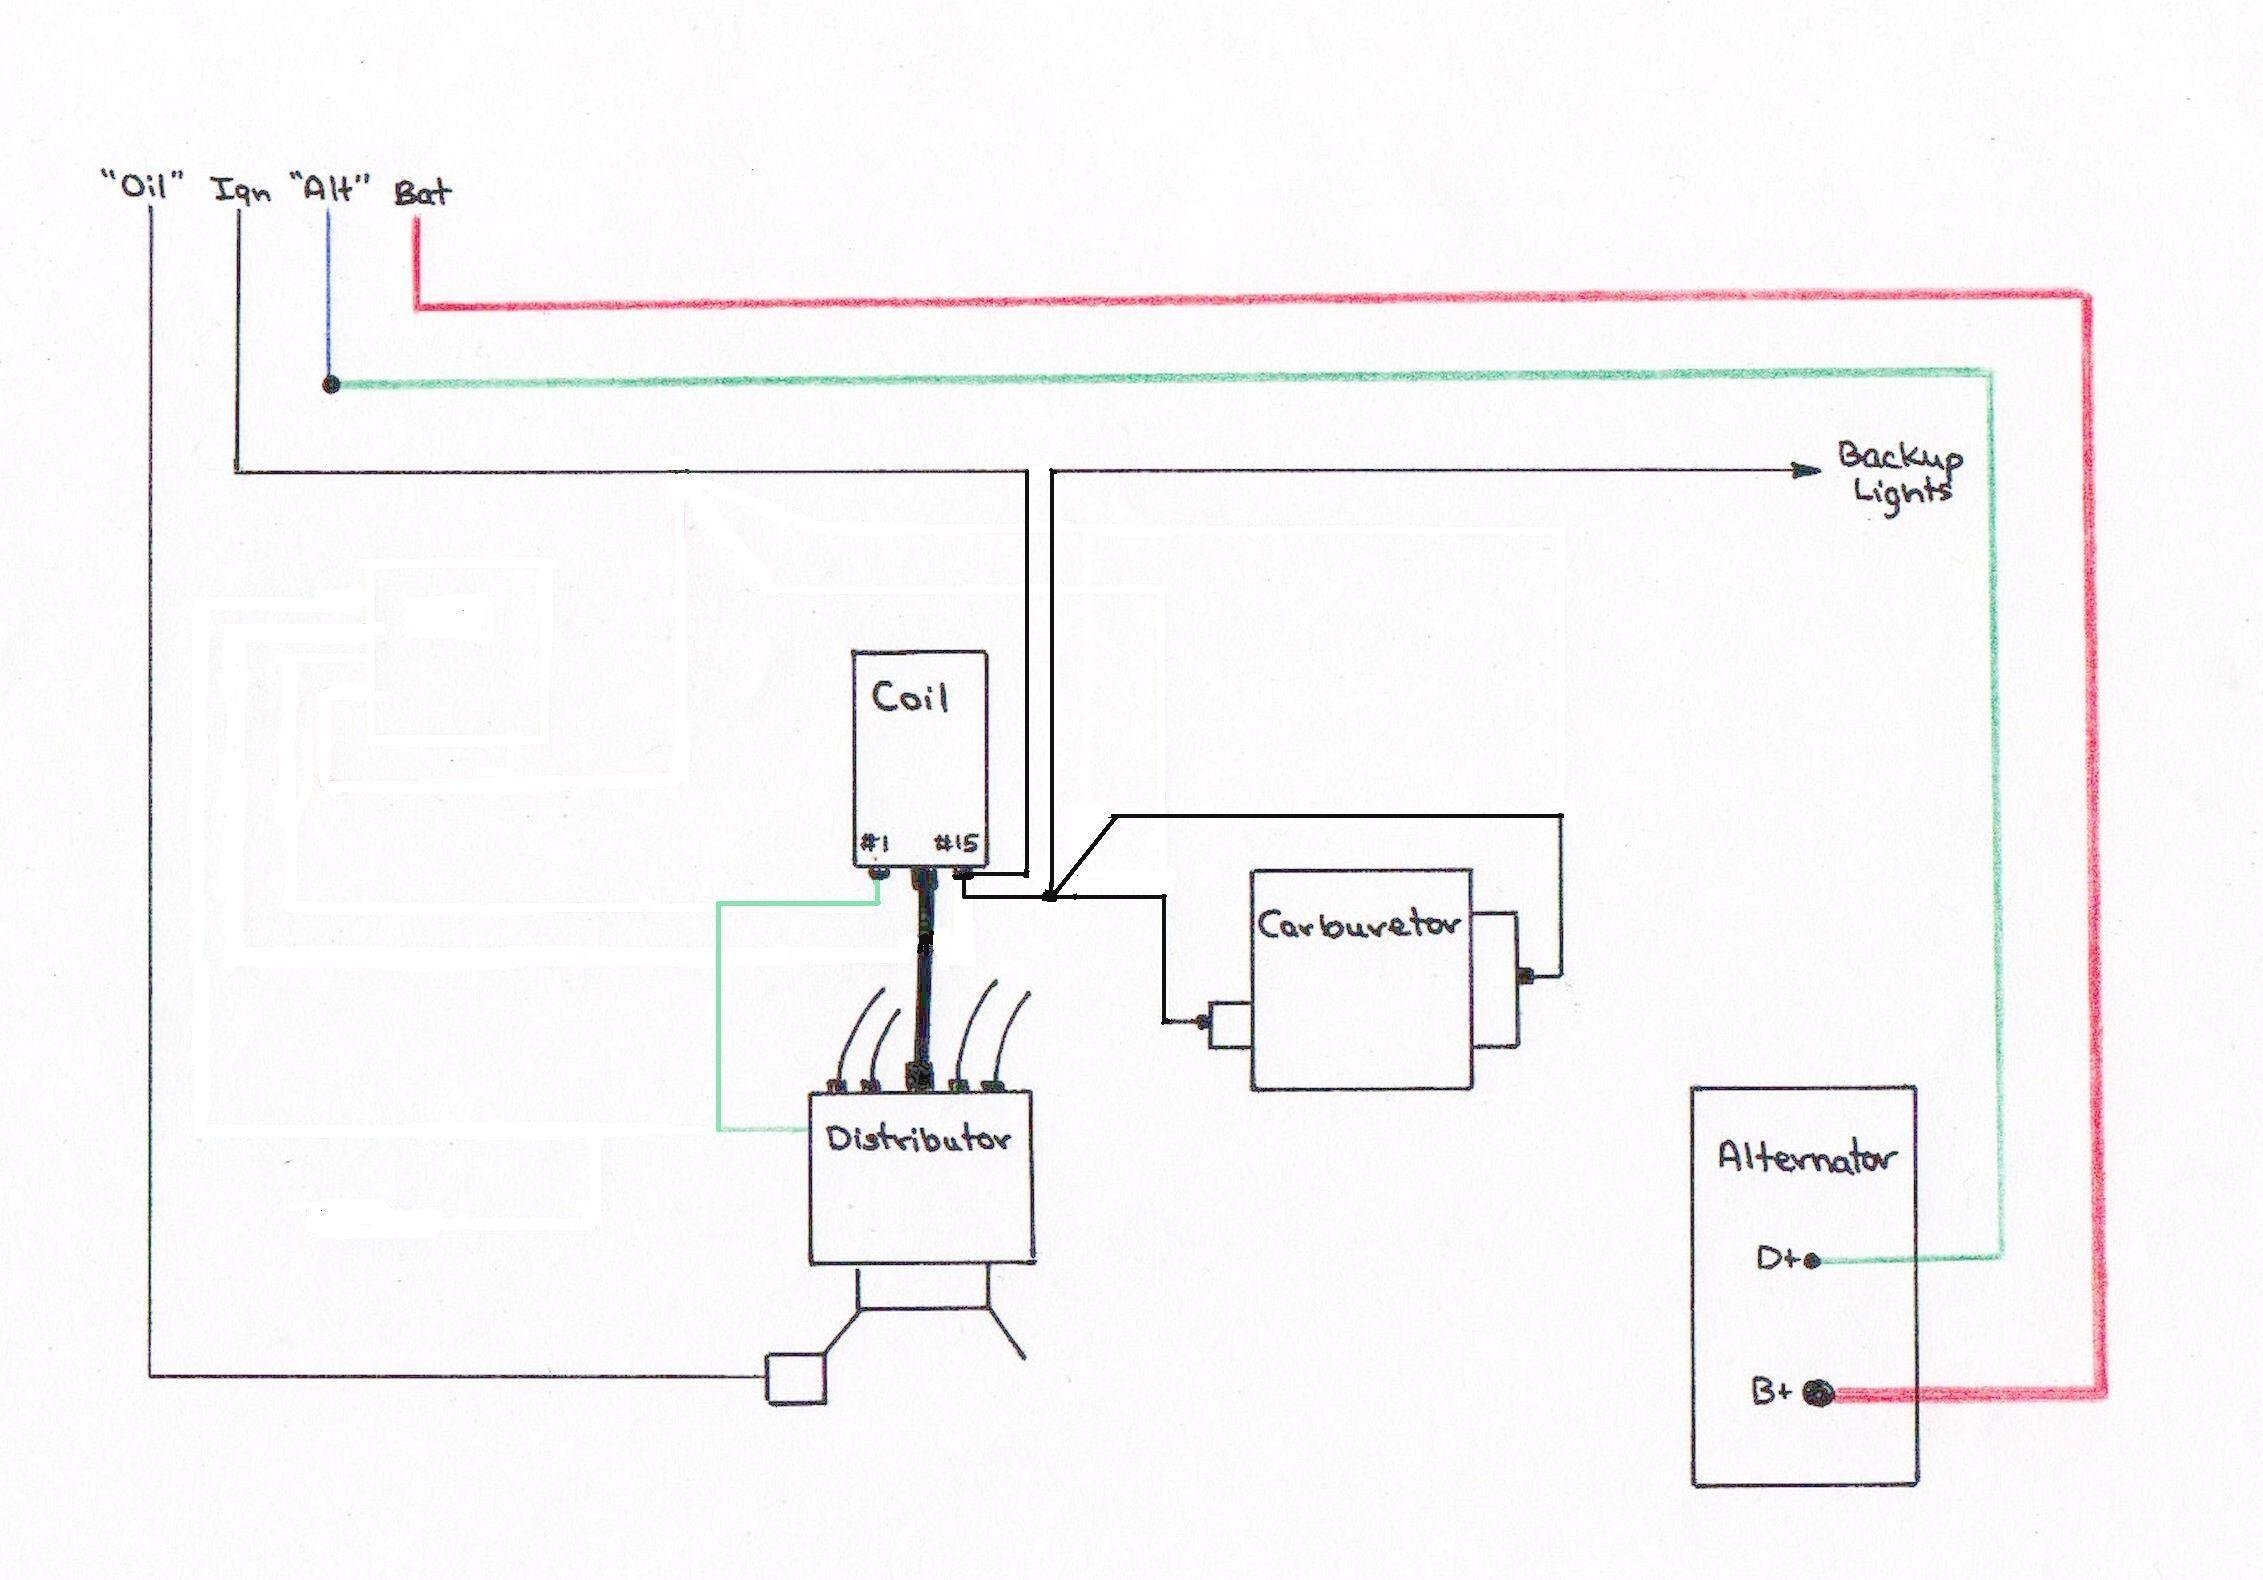 Luxury Wiring Diagram Of An Alternator Diagrams Digramssample Diagramimages Wiringdiagramsample Wiringdiagram Electrical Diagram Diagram Voltage Regulator